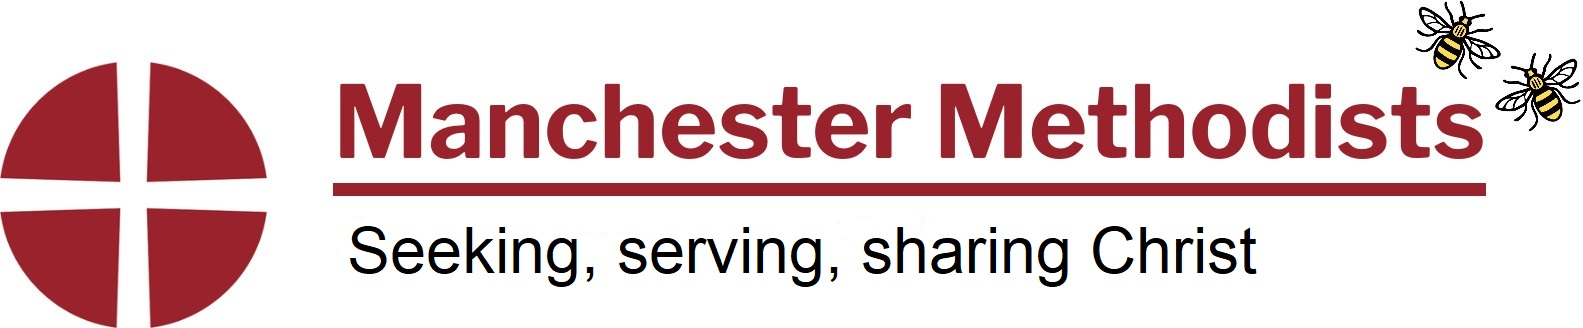 Manchester Methodists